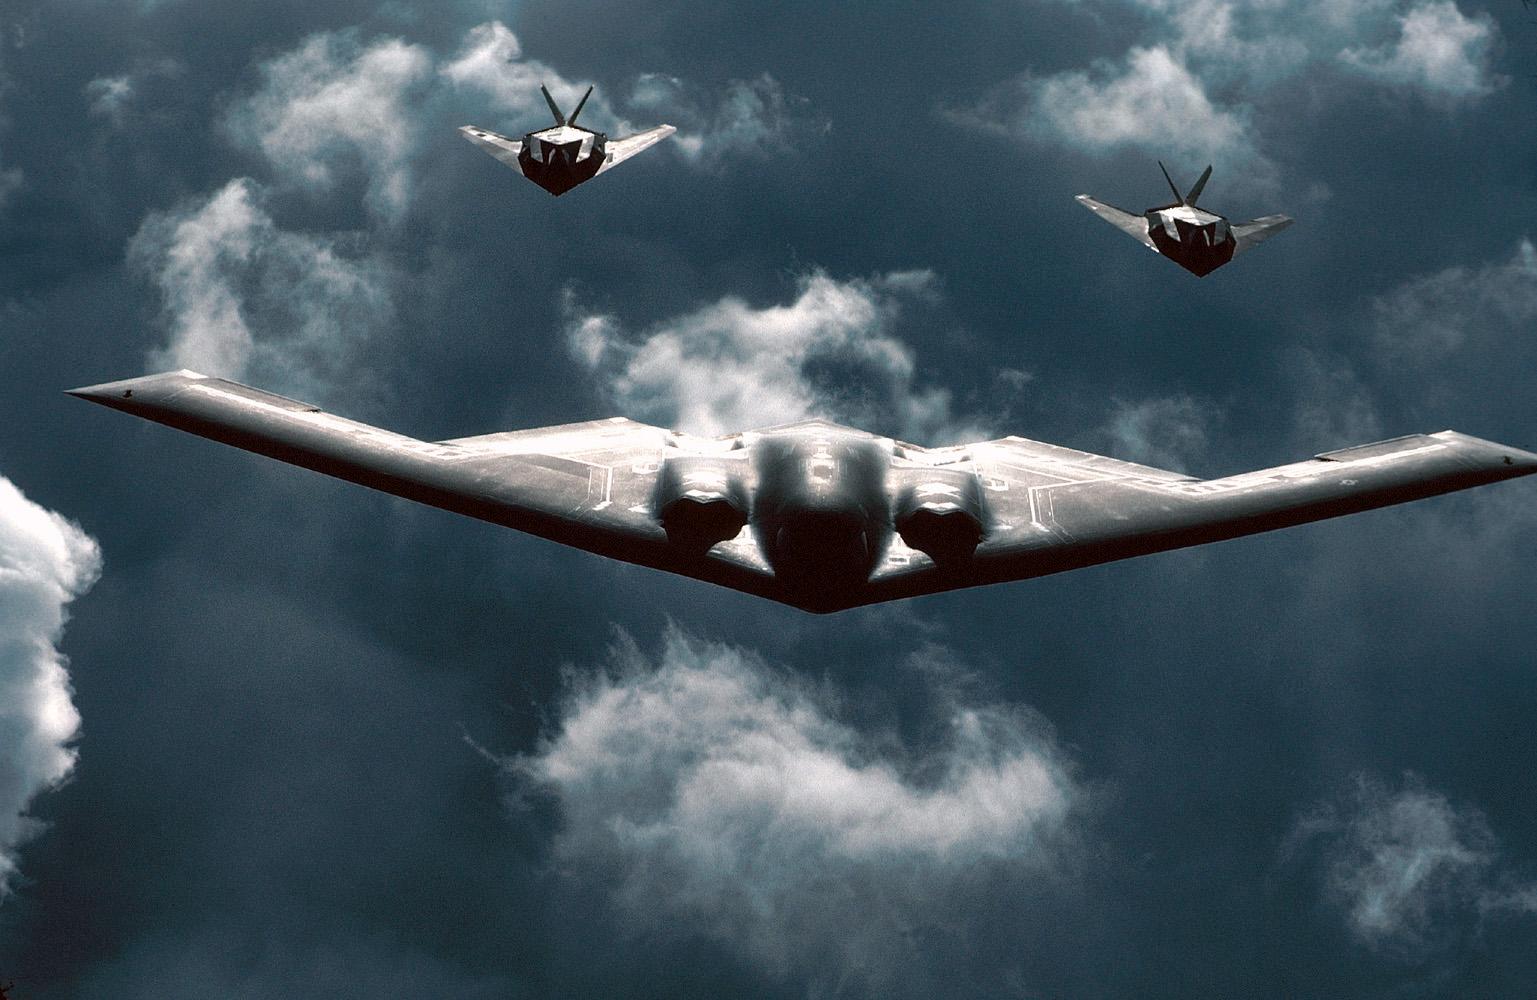 https://i2.wp.com/upload.wikimedia.org/wikipedia/commons/4/46/B-2_and_F-117_Formation.jpg